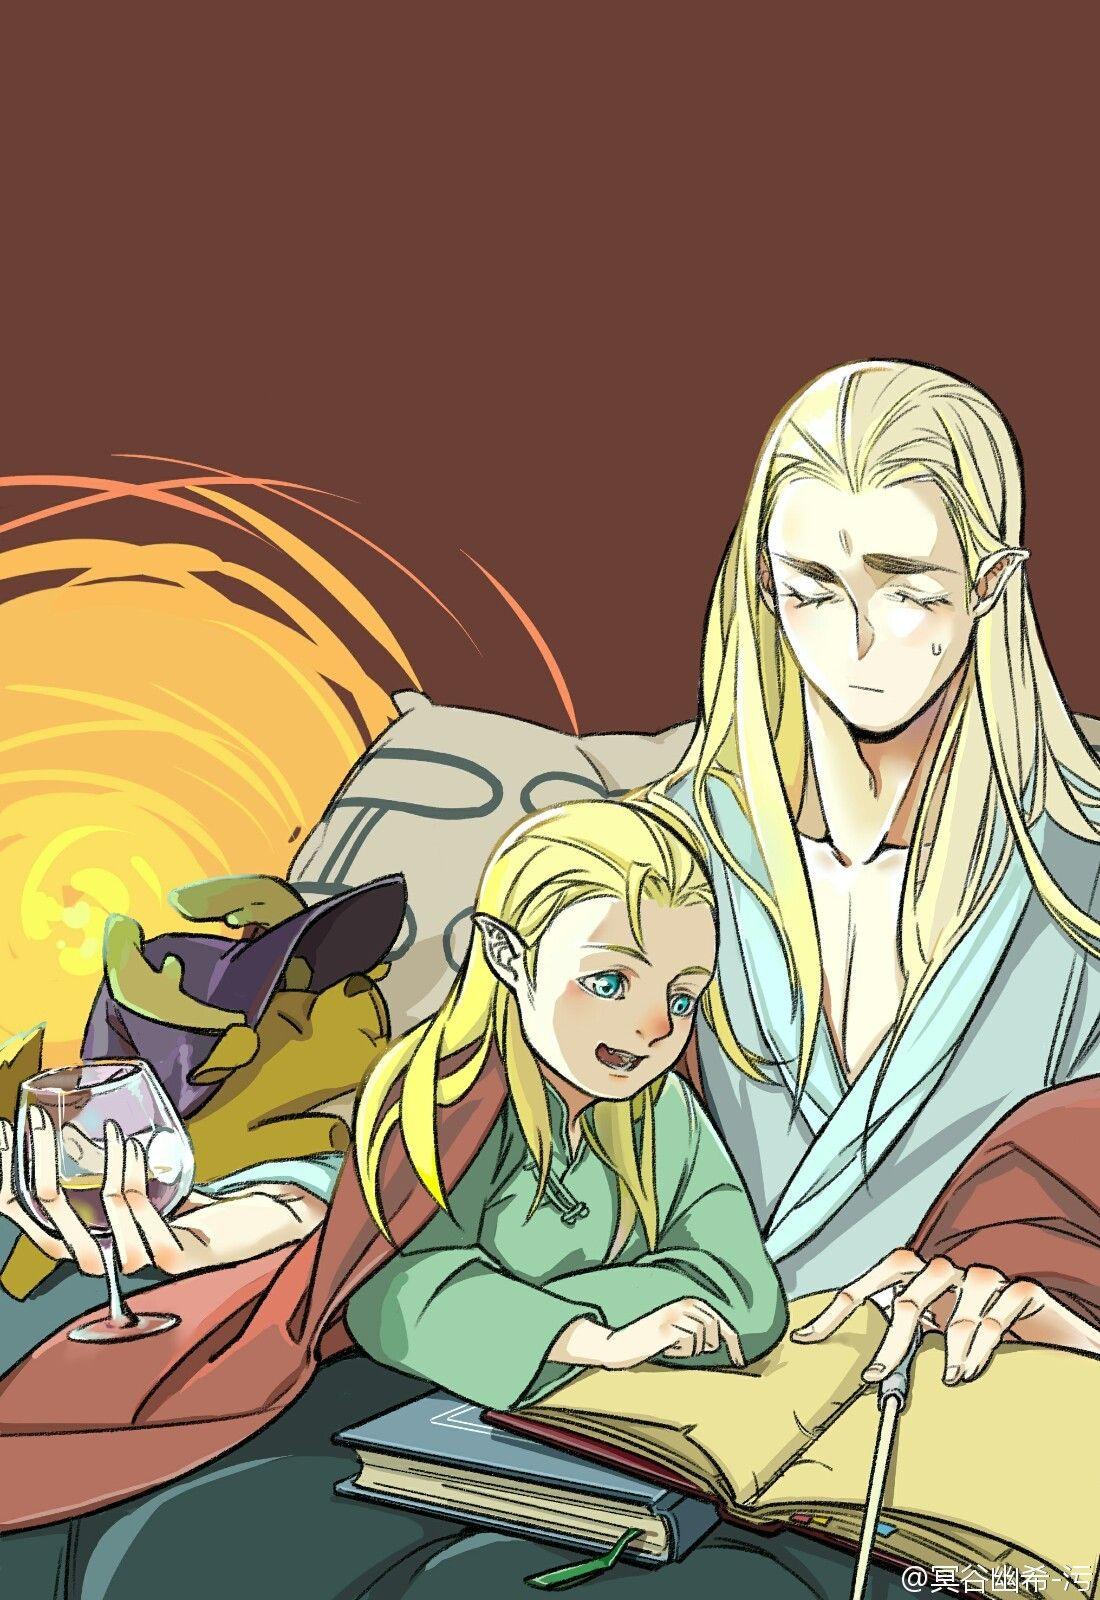 Thranduil and little legolas Thranduil:please Legolas, sleep son